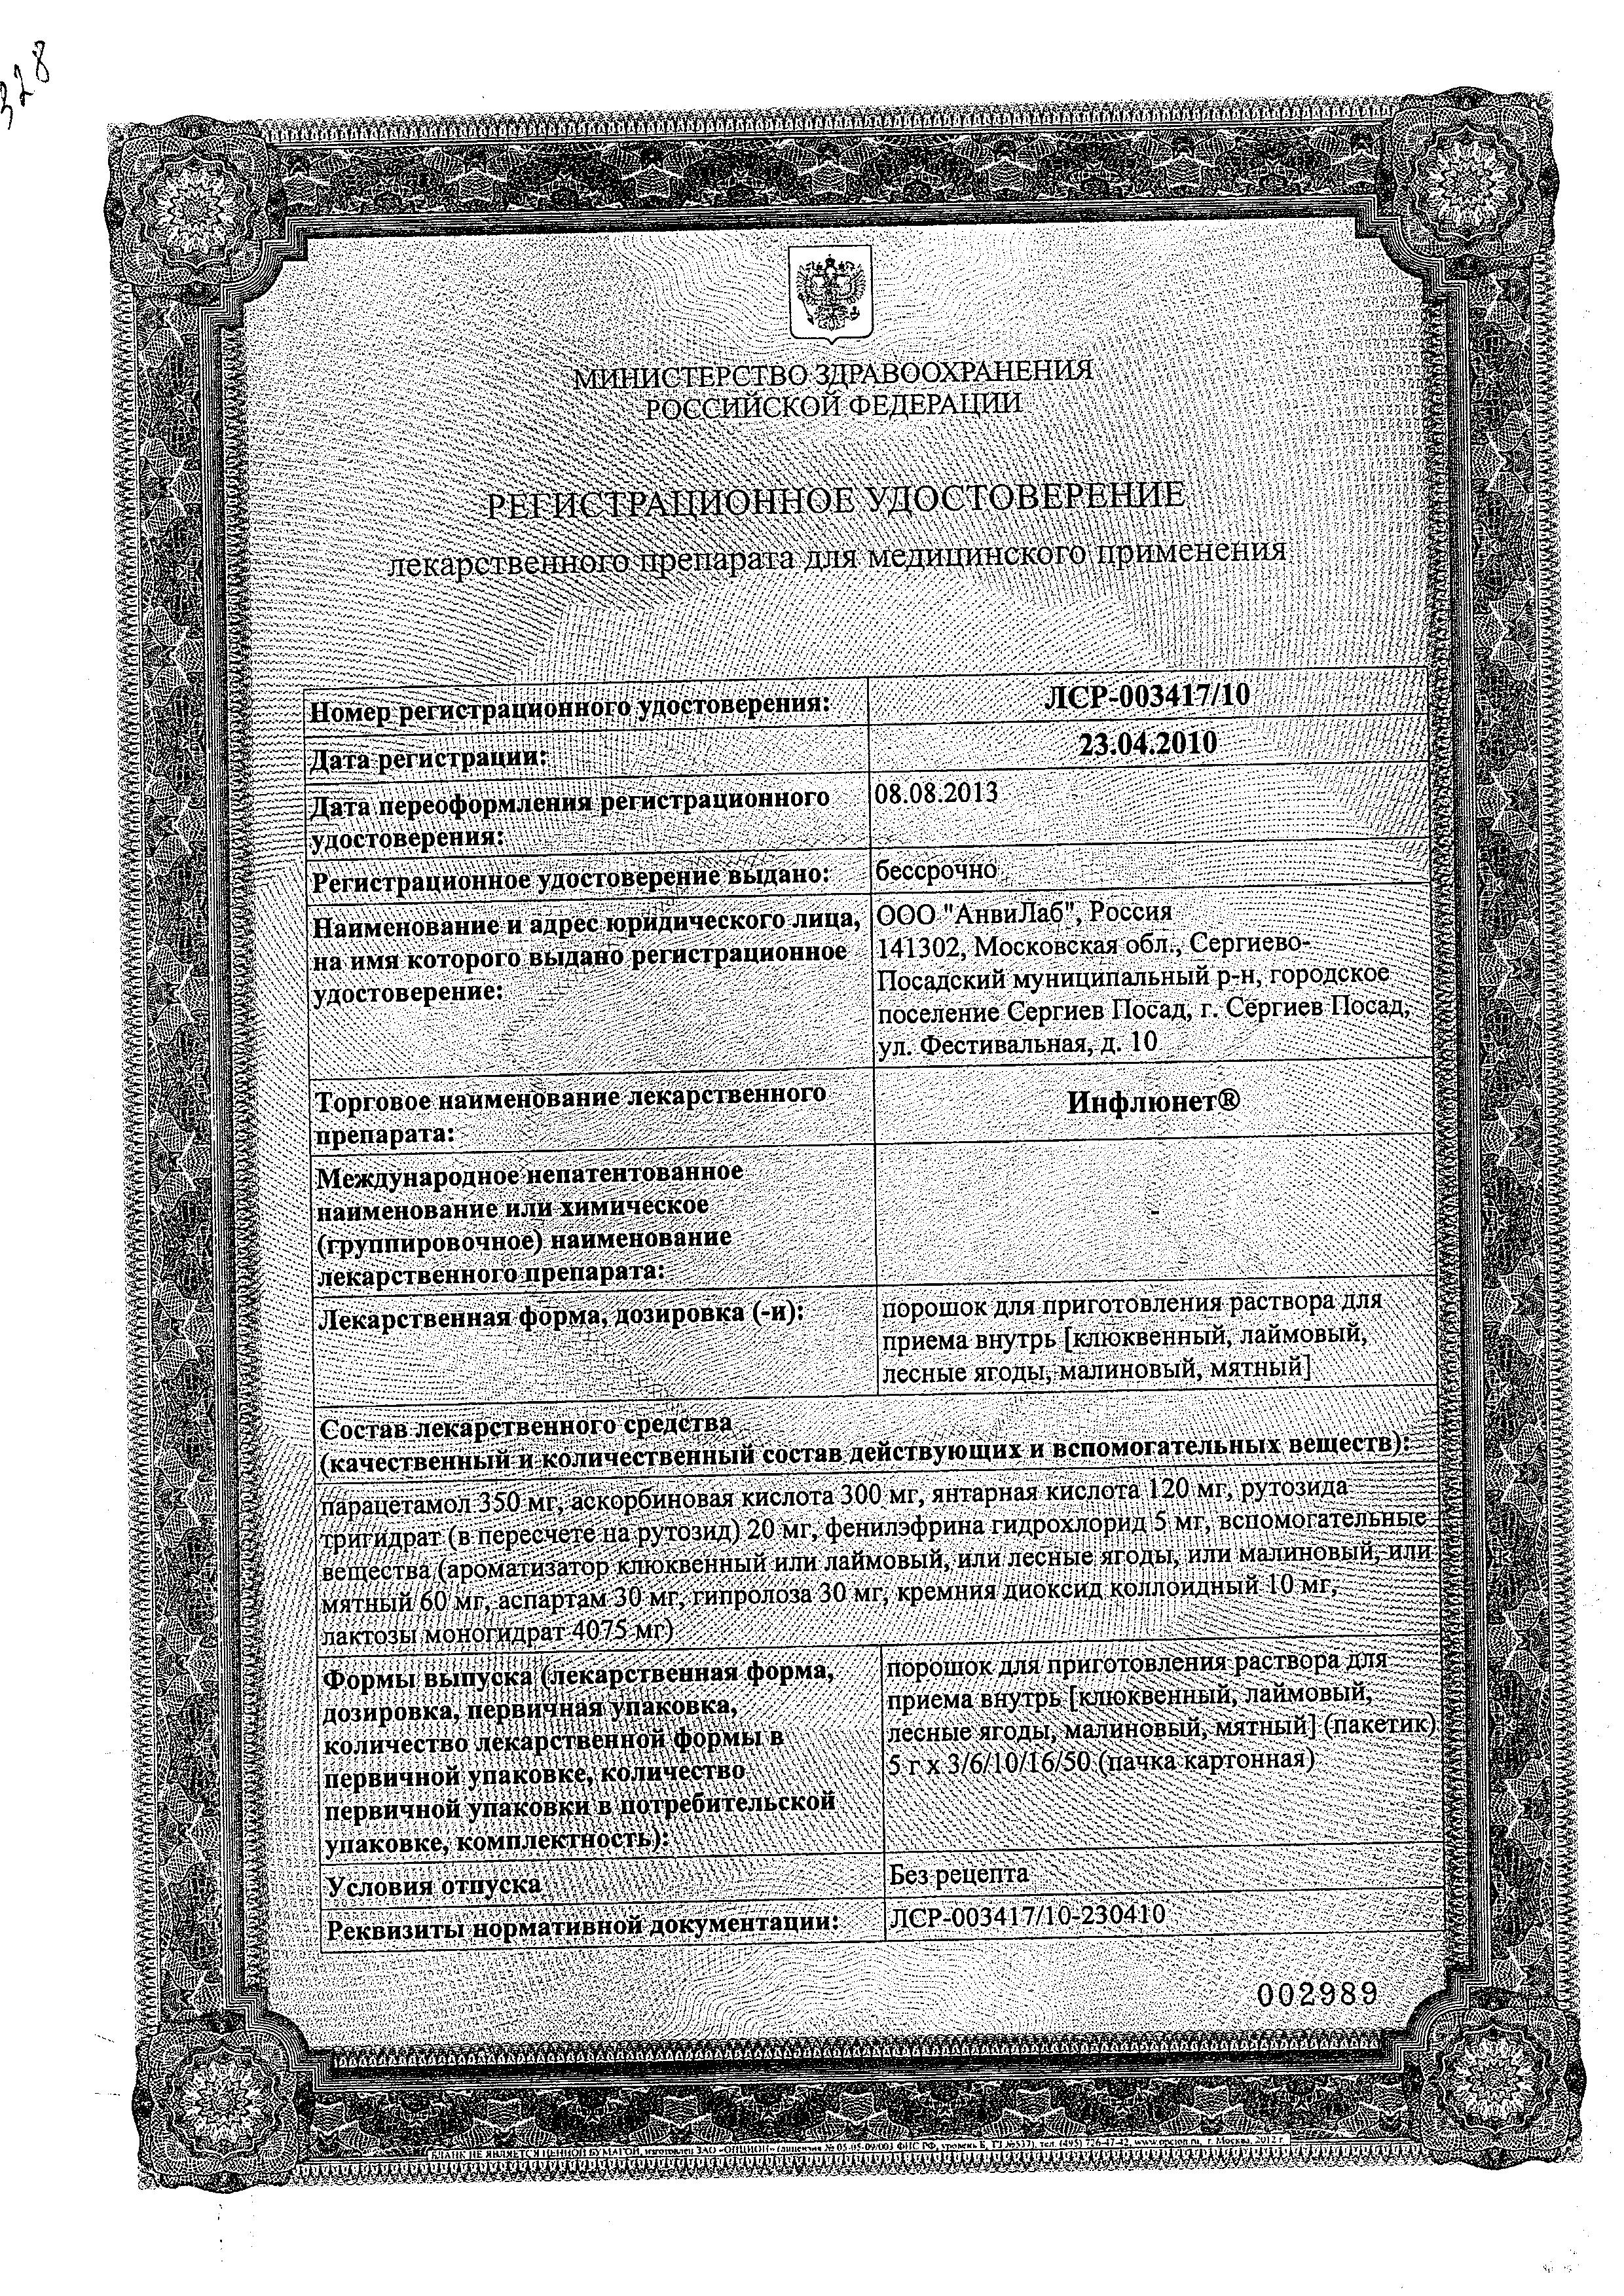 Инфлюнет сертификат